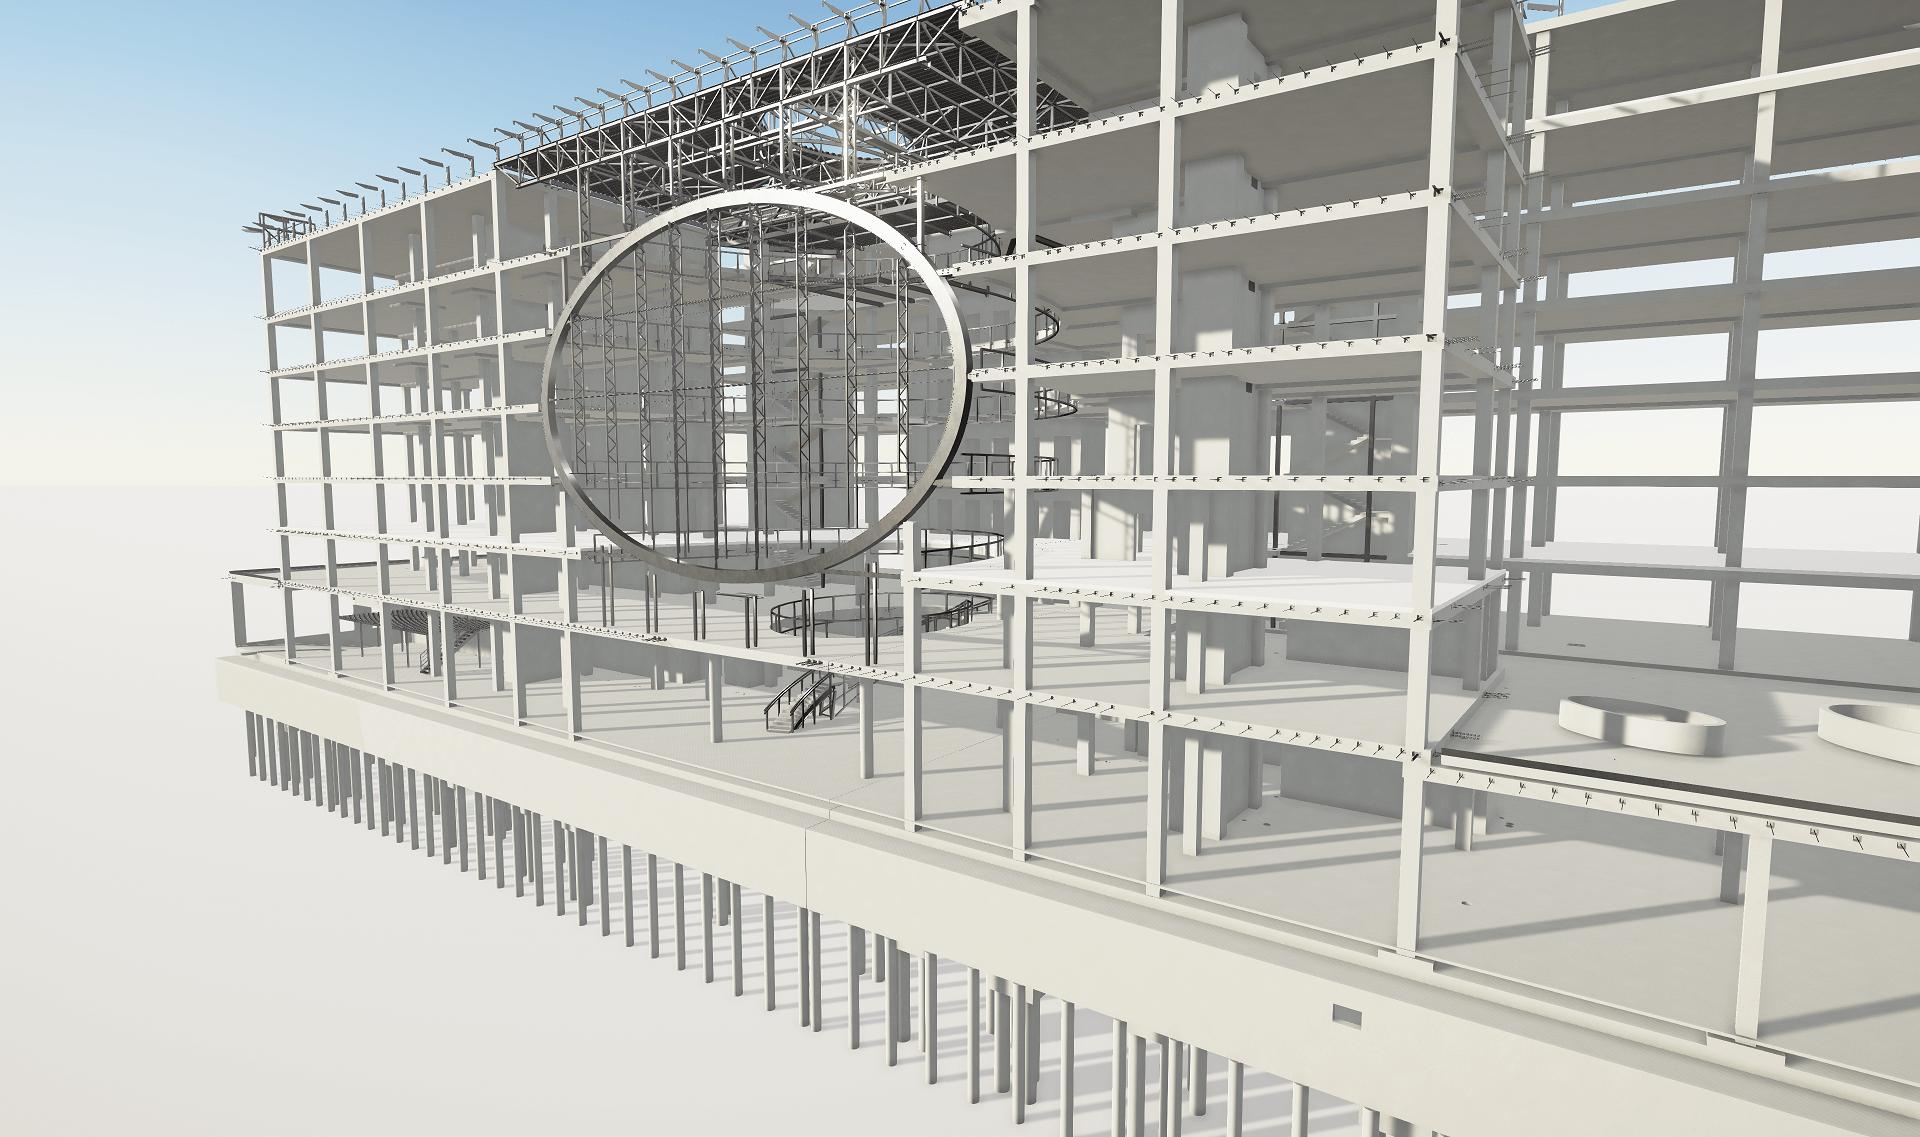 U219 verslo centro integruotas BIM projektavimas